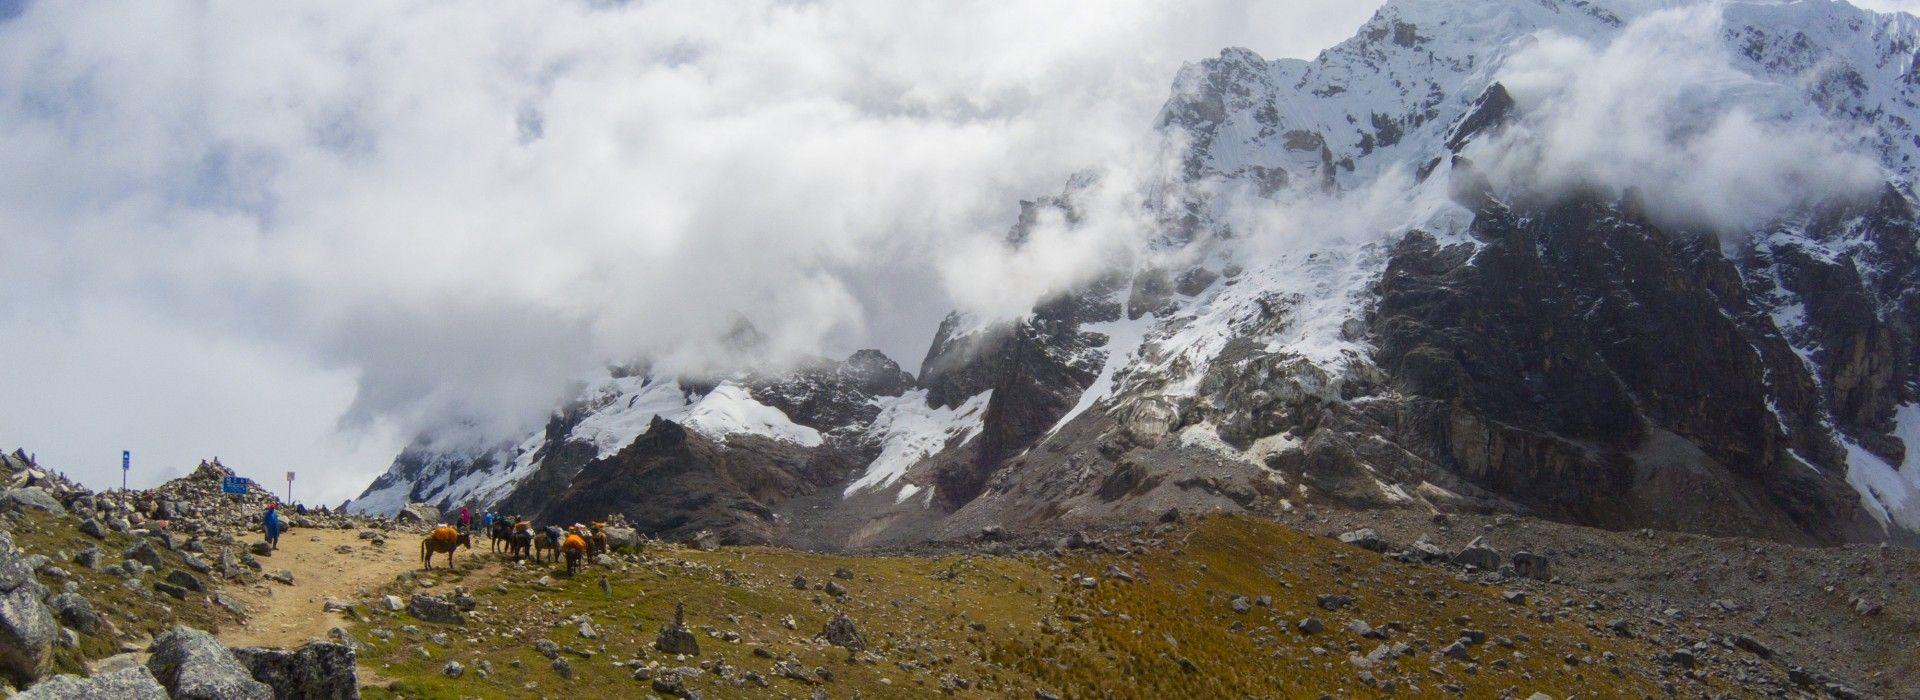 Trekking Tours in Salkantay Trek